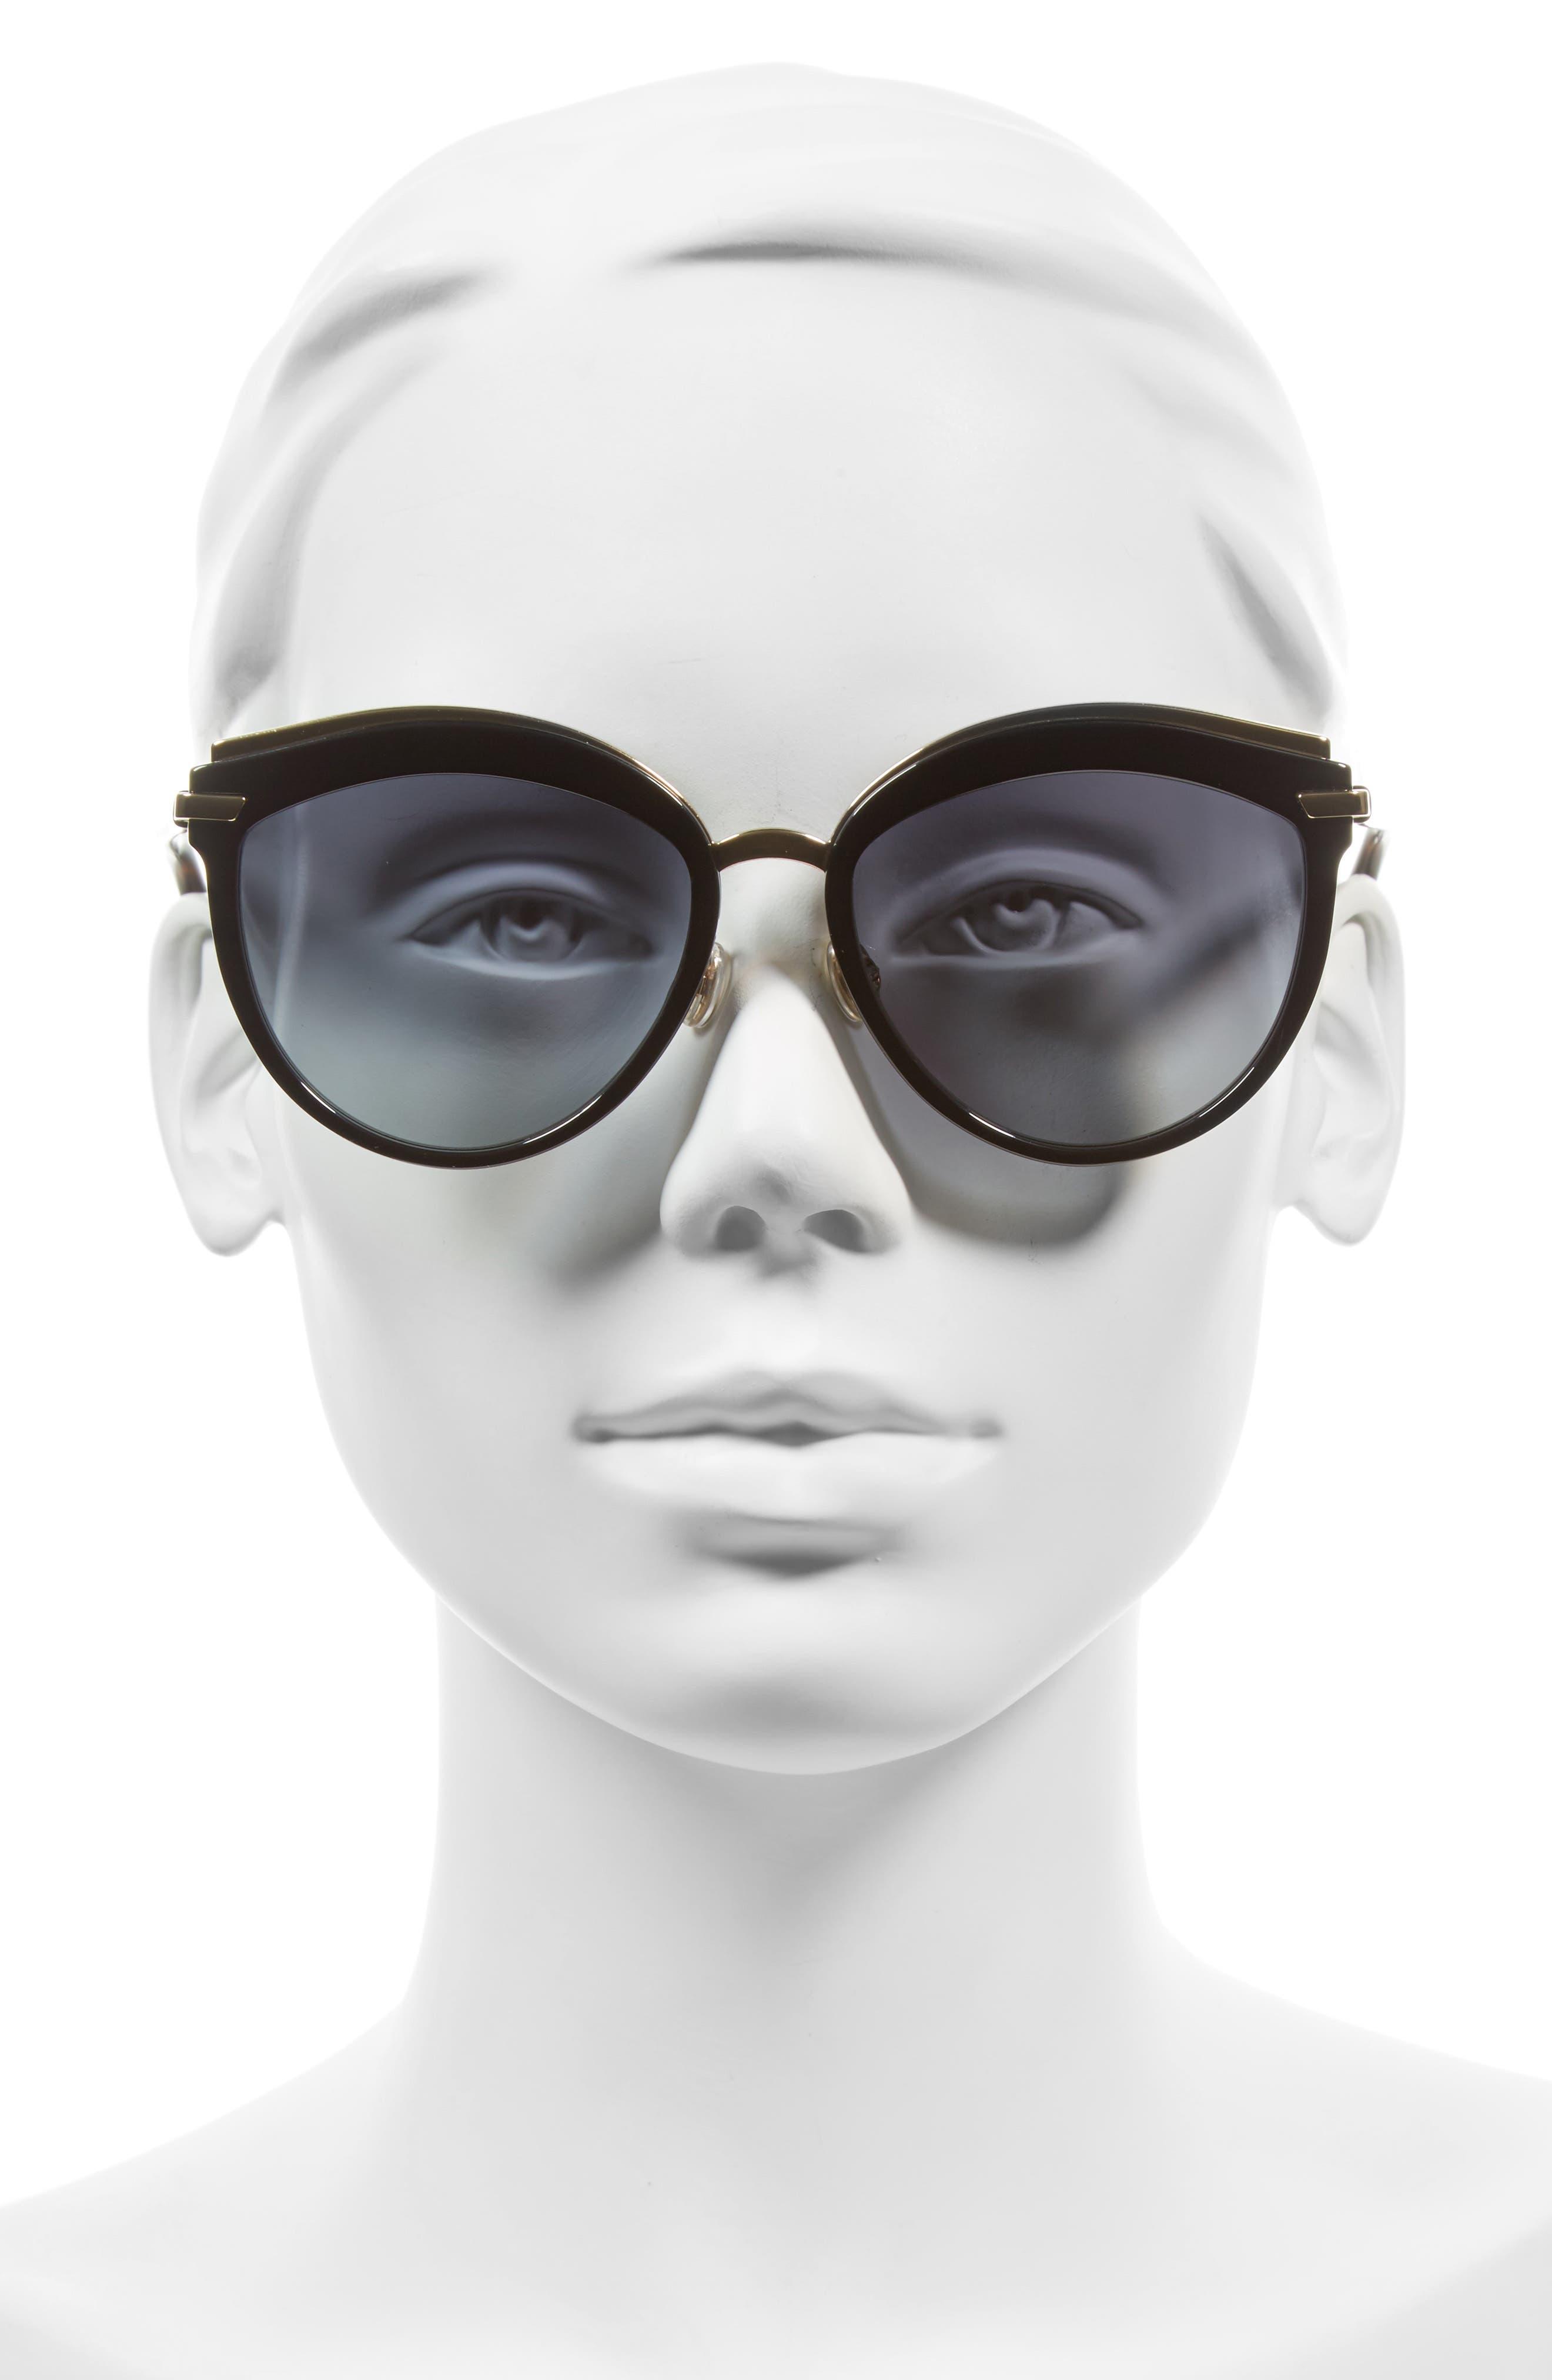 Offset 2 55mm Sunglasses,                             Alternate thumbnail 2, color,                             Black/ Havana